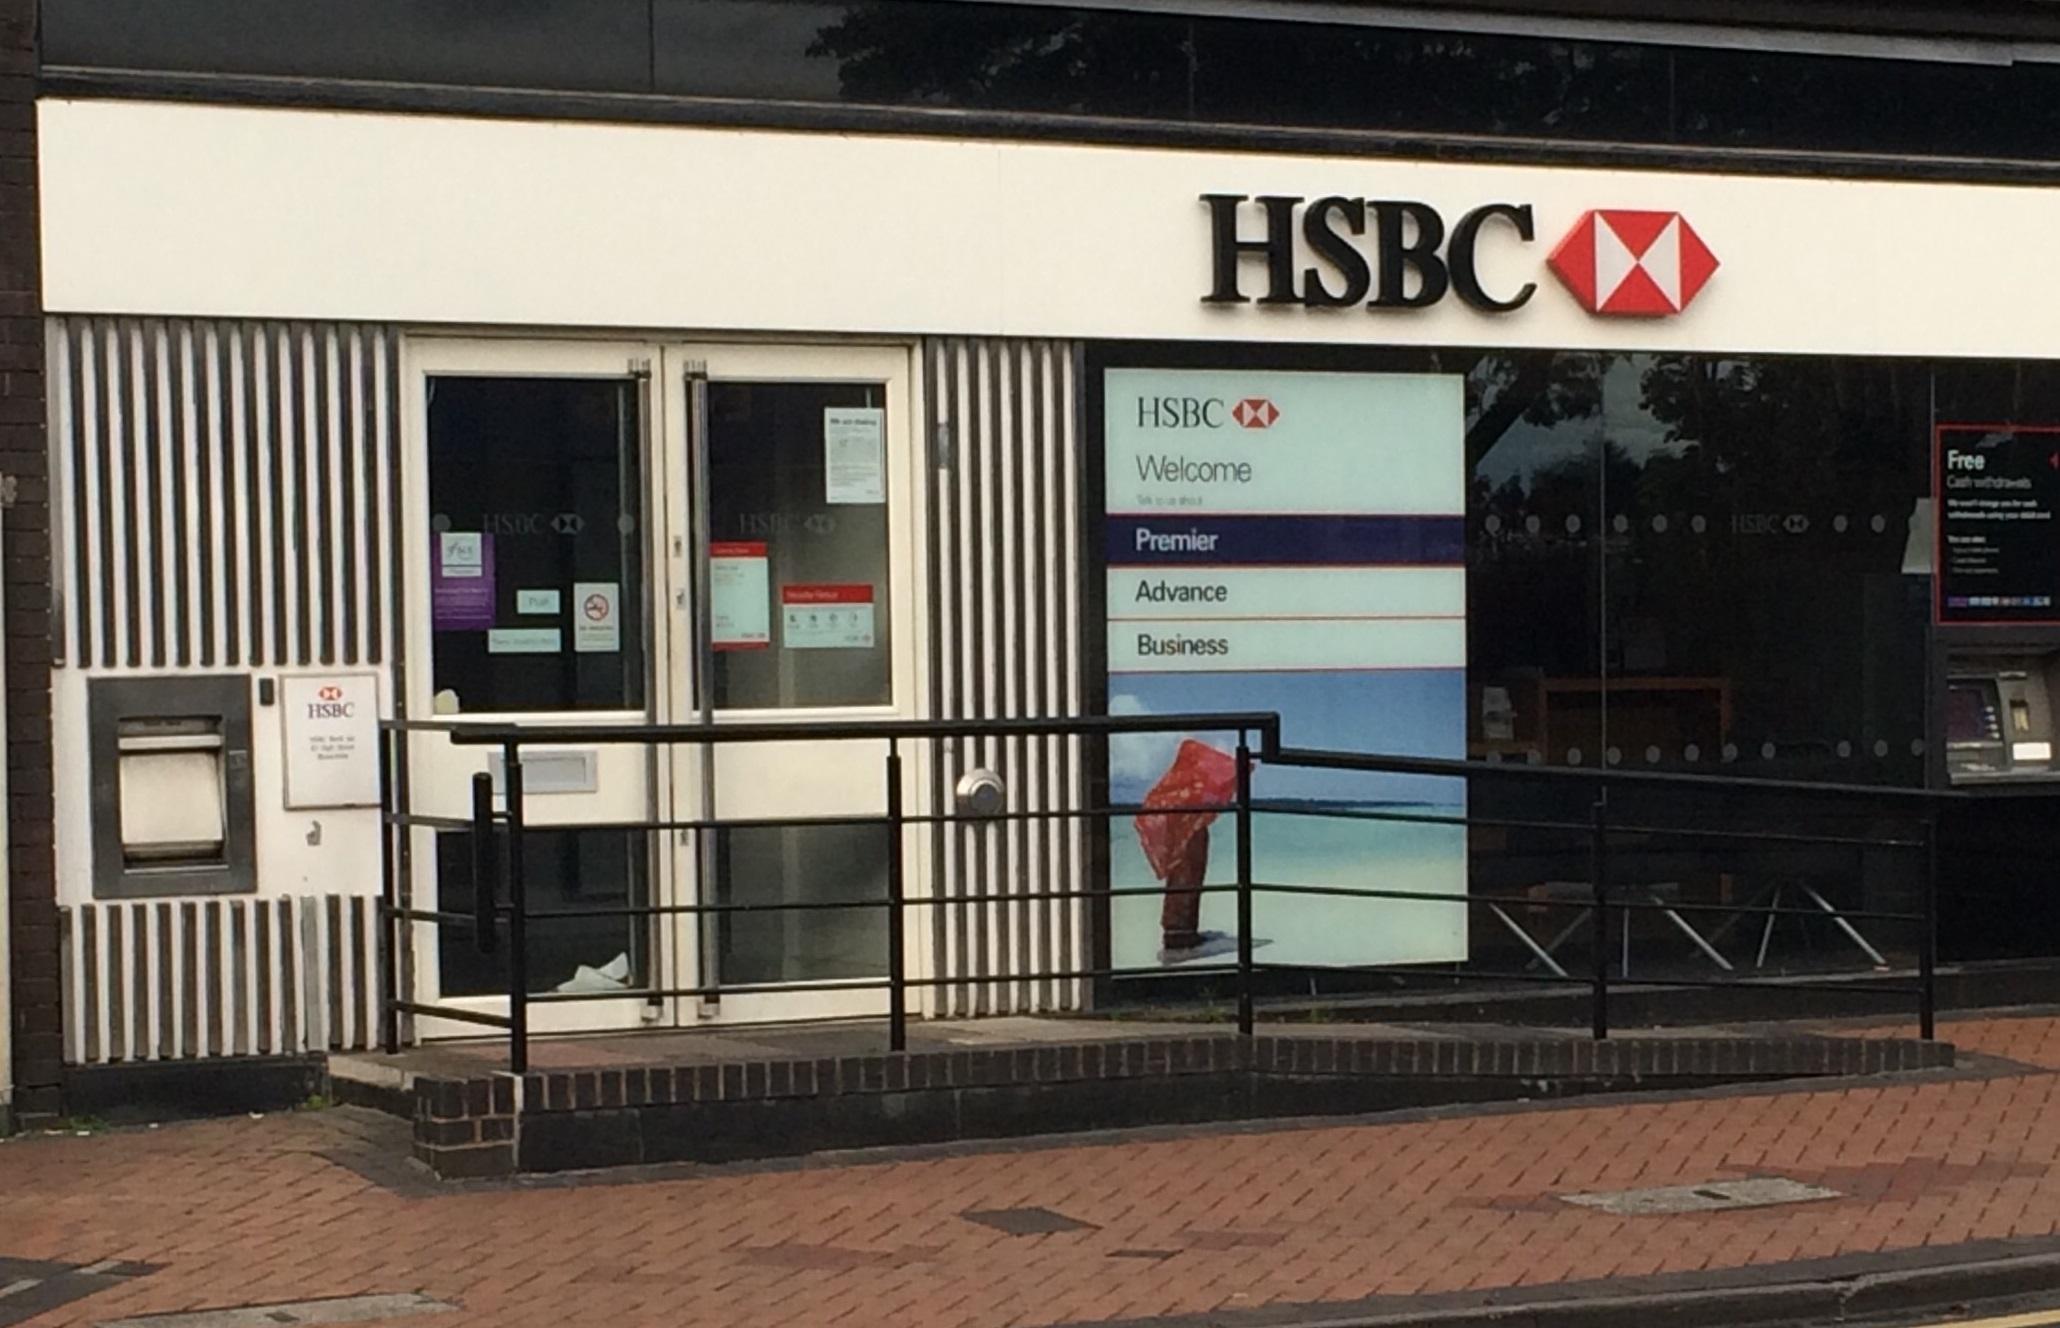 Brownhills HSBC Update